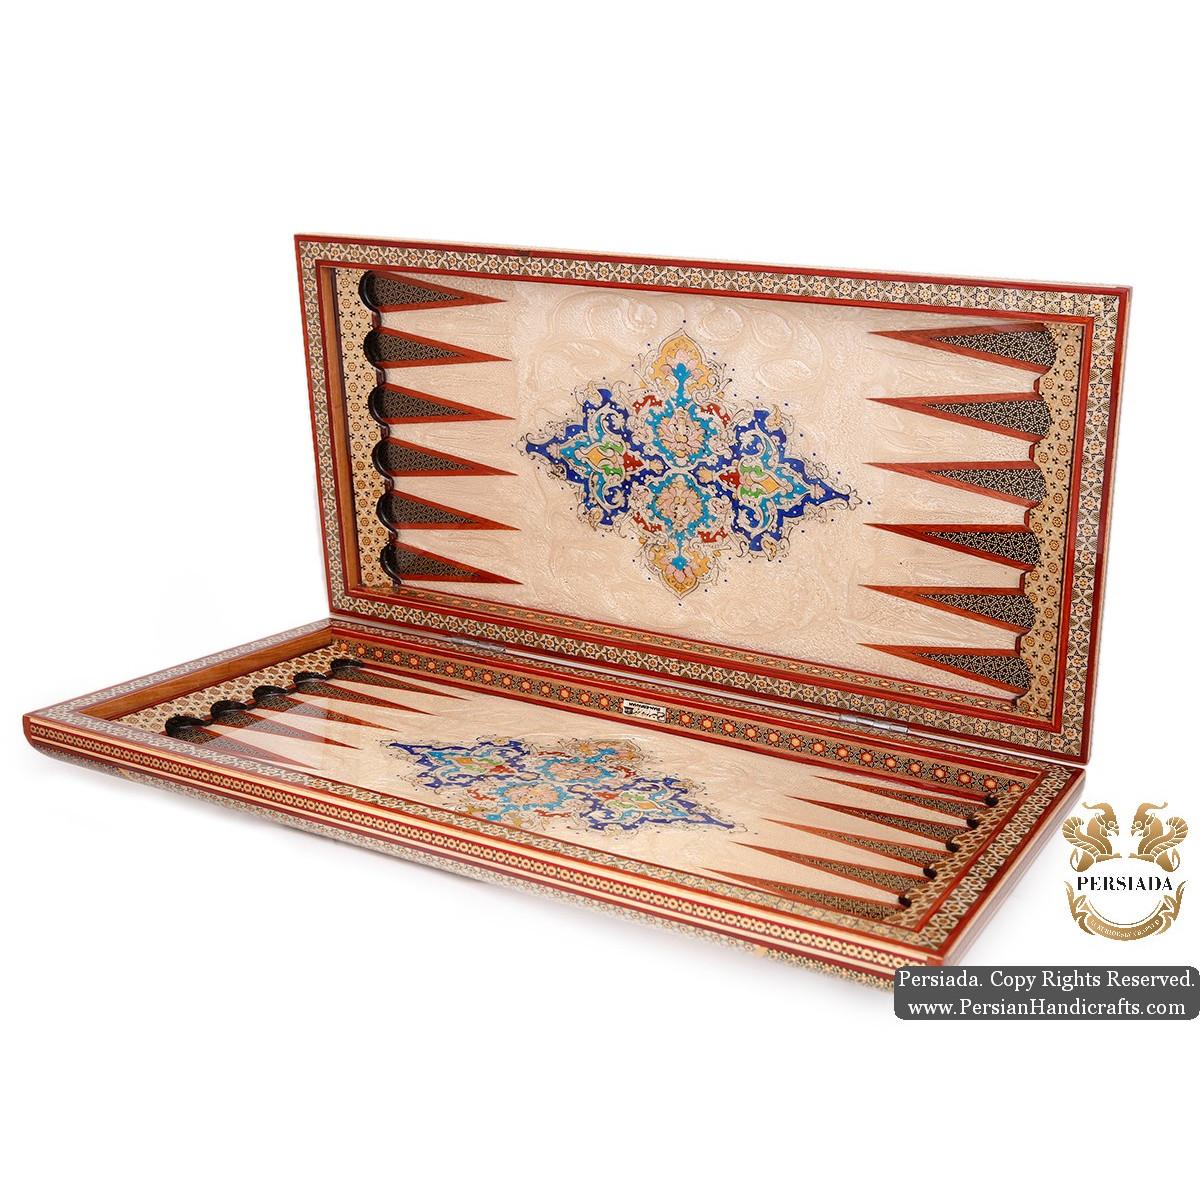 Backgammon & Chess Set | Superior Miniature Khatam Marquetry | HKH5114-Persian Handicrafts